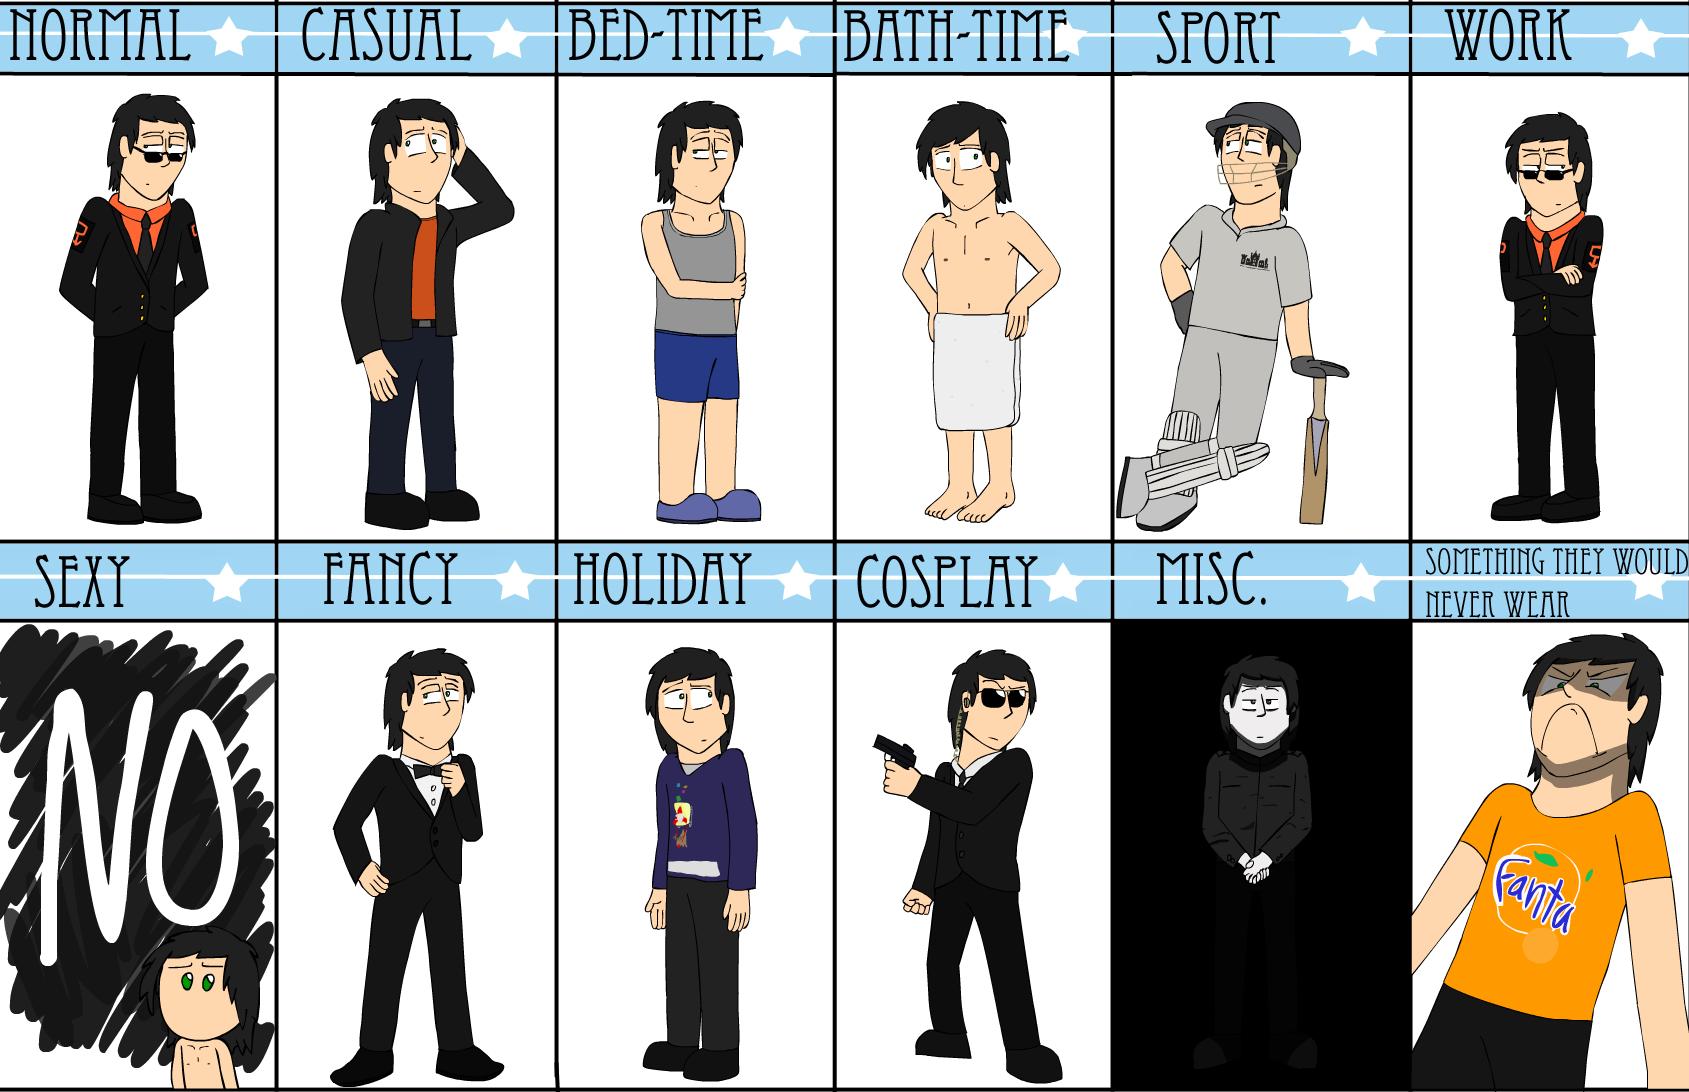 Outfit Meme - Oblivion by TurboJUK